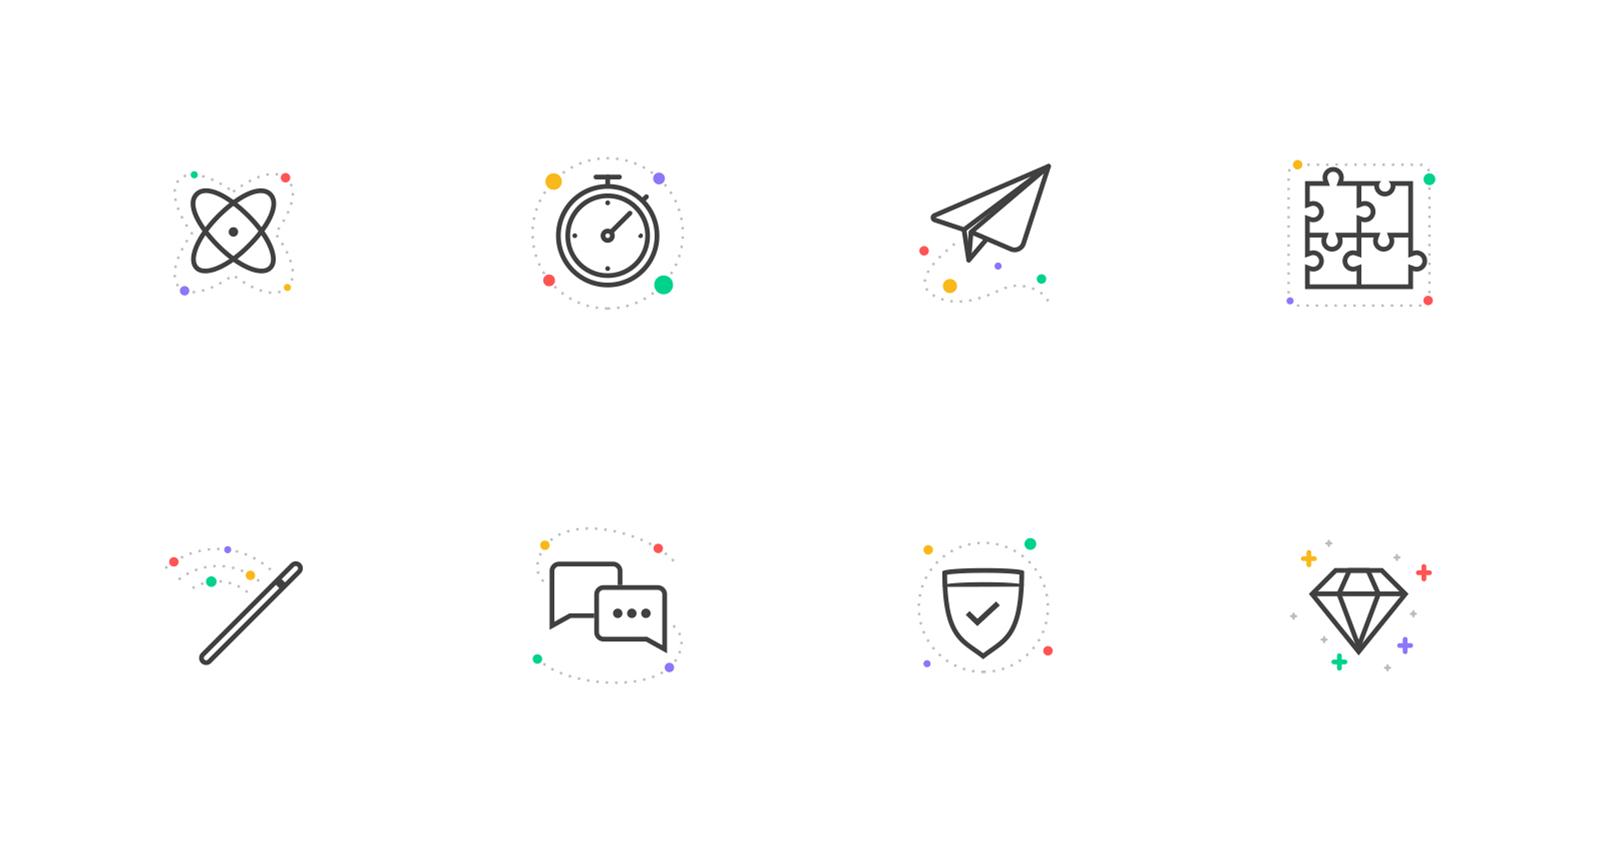 Clubhouse 品牌启用新的logo和形象设计-VI设计6